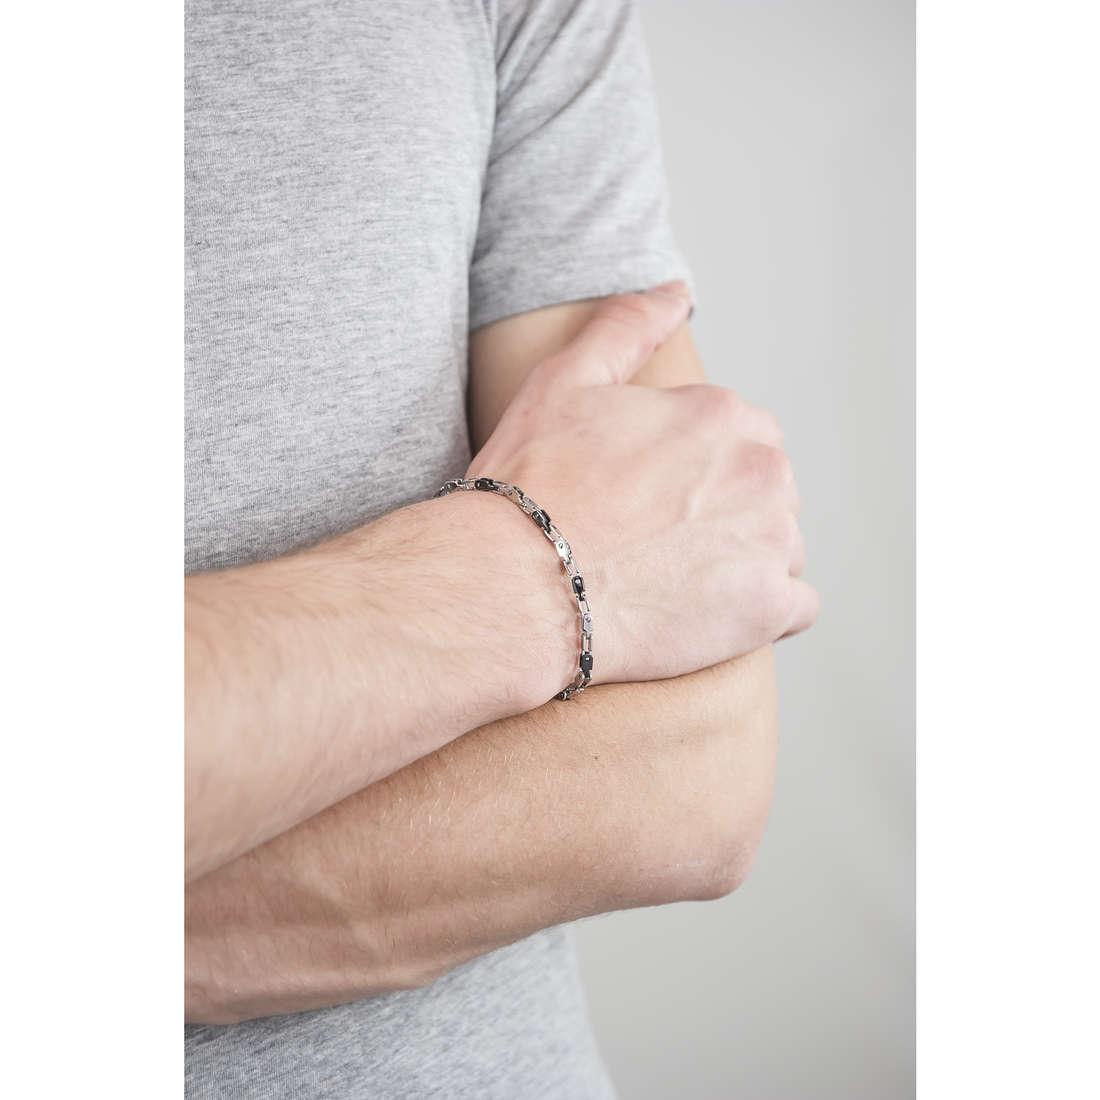 Morellato bracciali Alfa uomo SAEV08 indosso